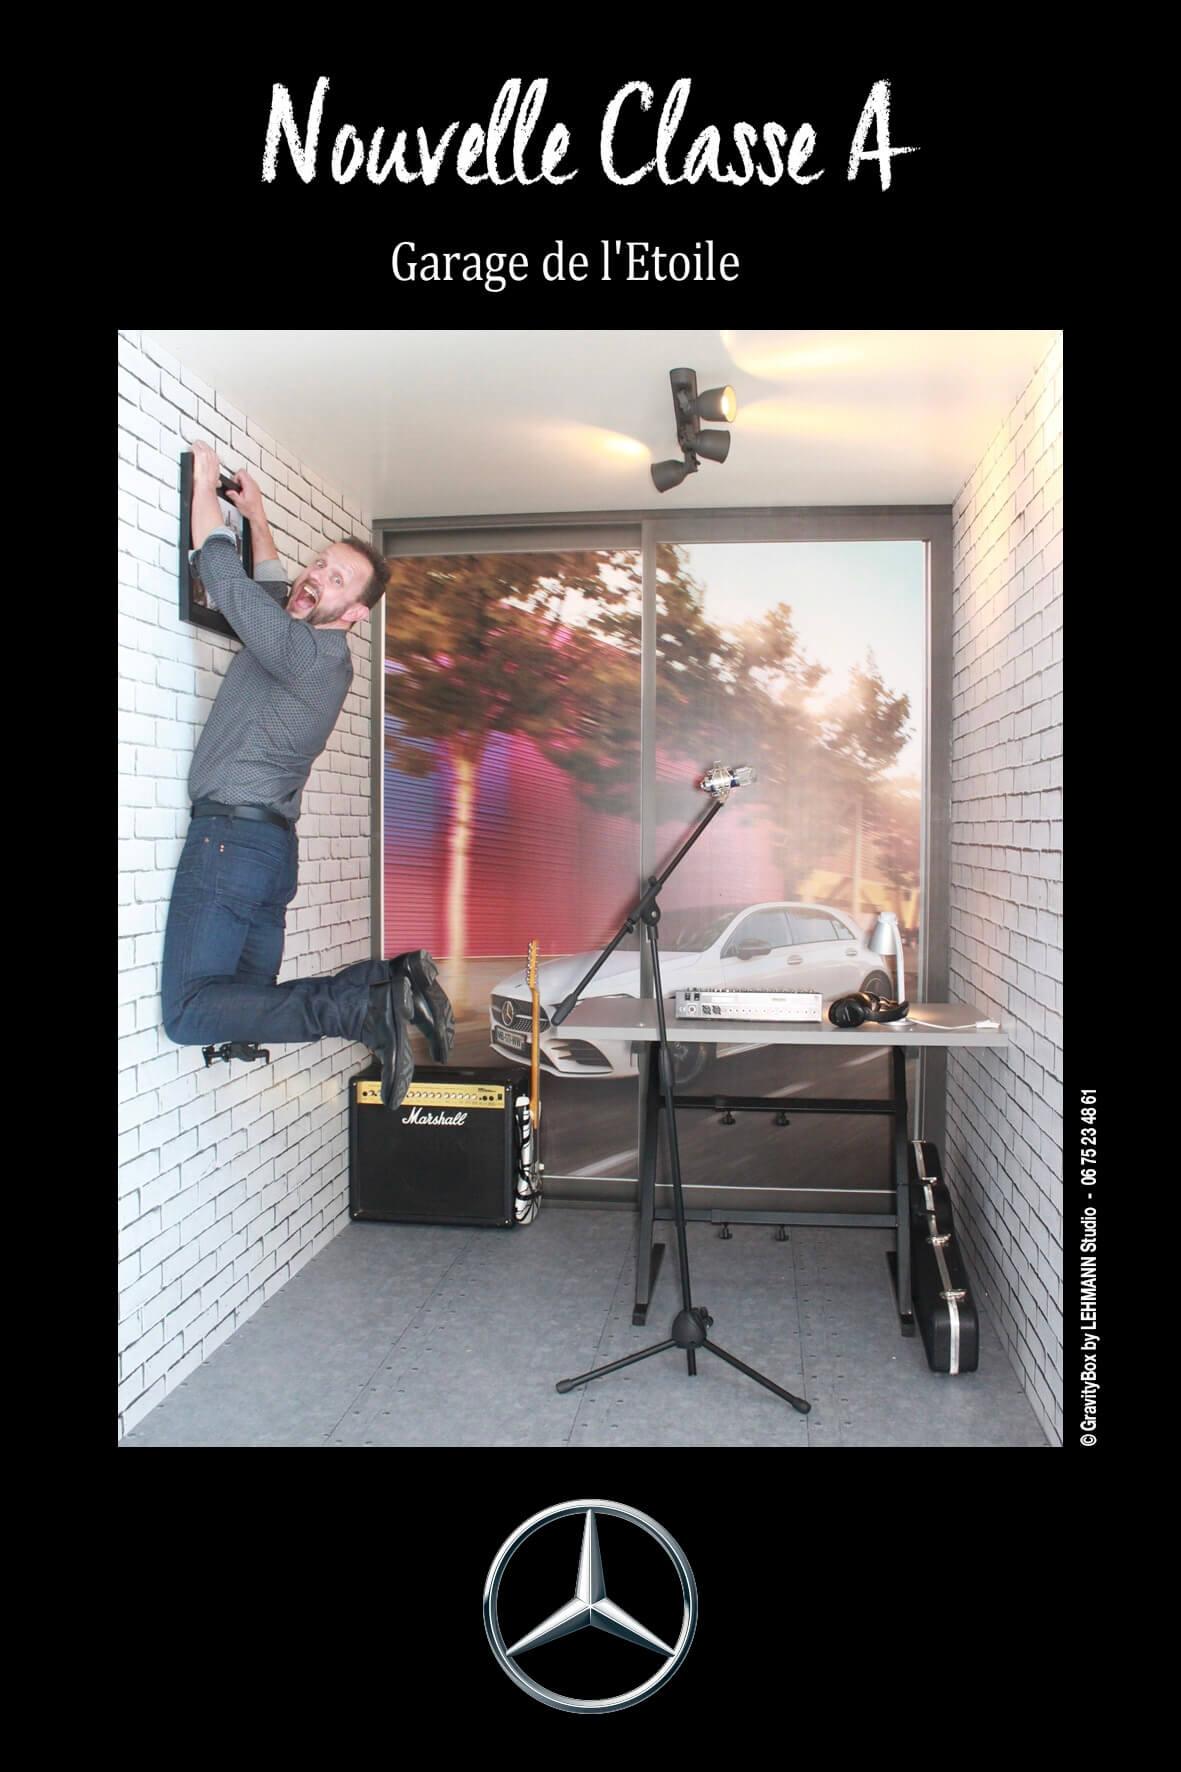 lehman-studio-photographe-angers-evenementiel-gravitybox-ambiance-studio-enregistrement-mercedes-benz